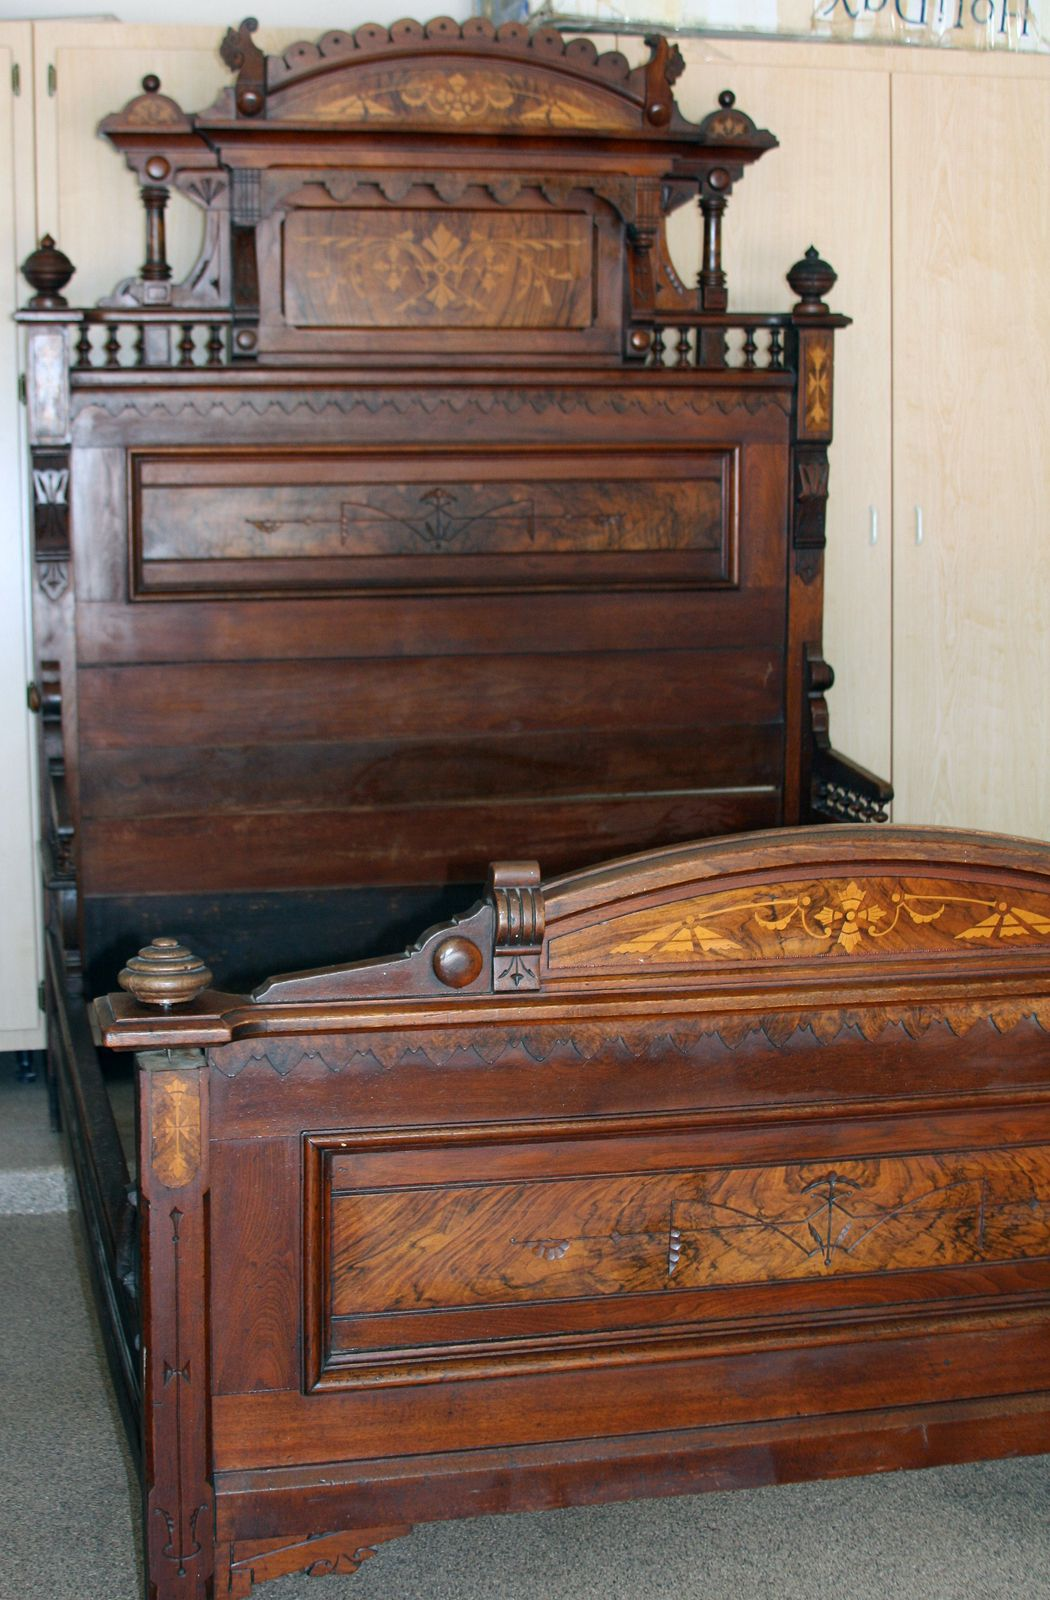 vintage bedroom chair ebay mid century modern office antique bed eastlake style walnut w burl inlays 1800 39s